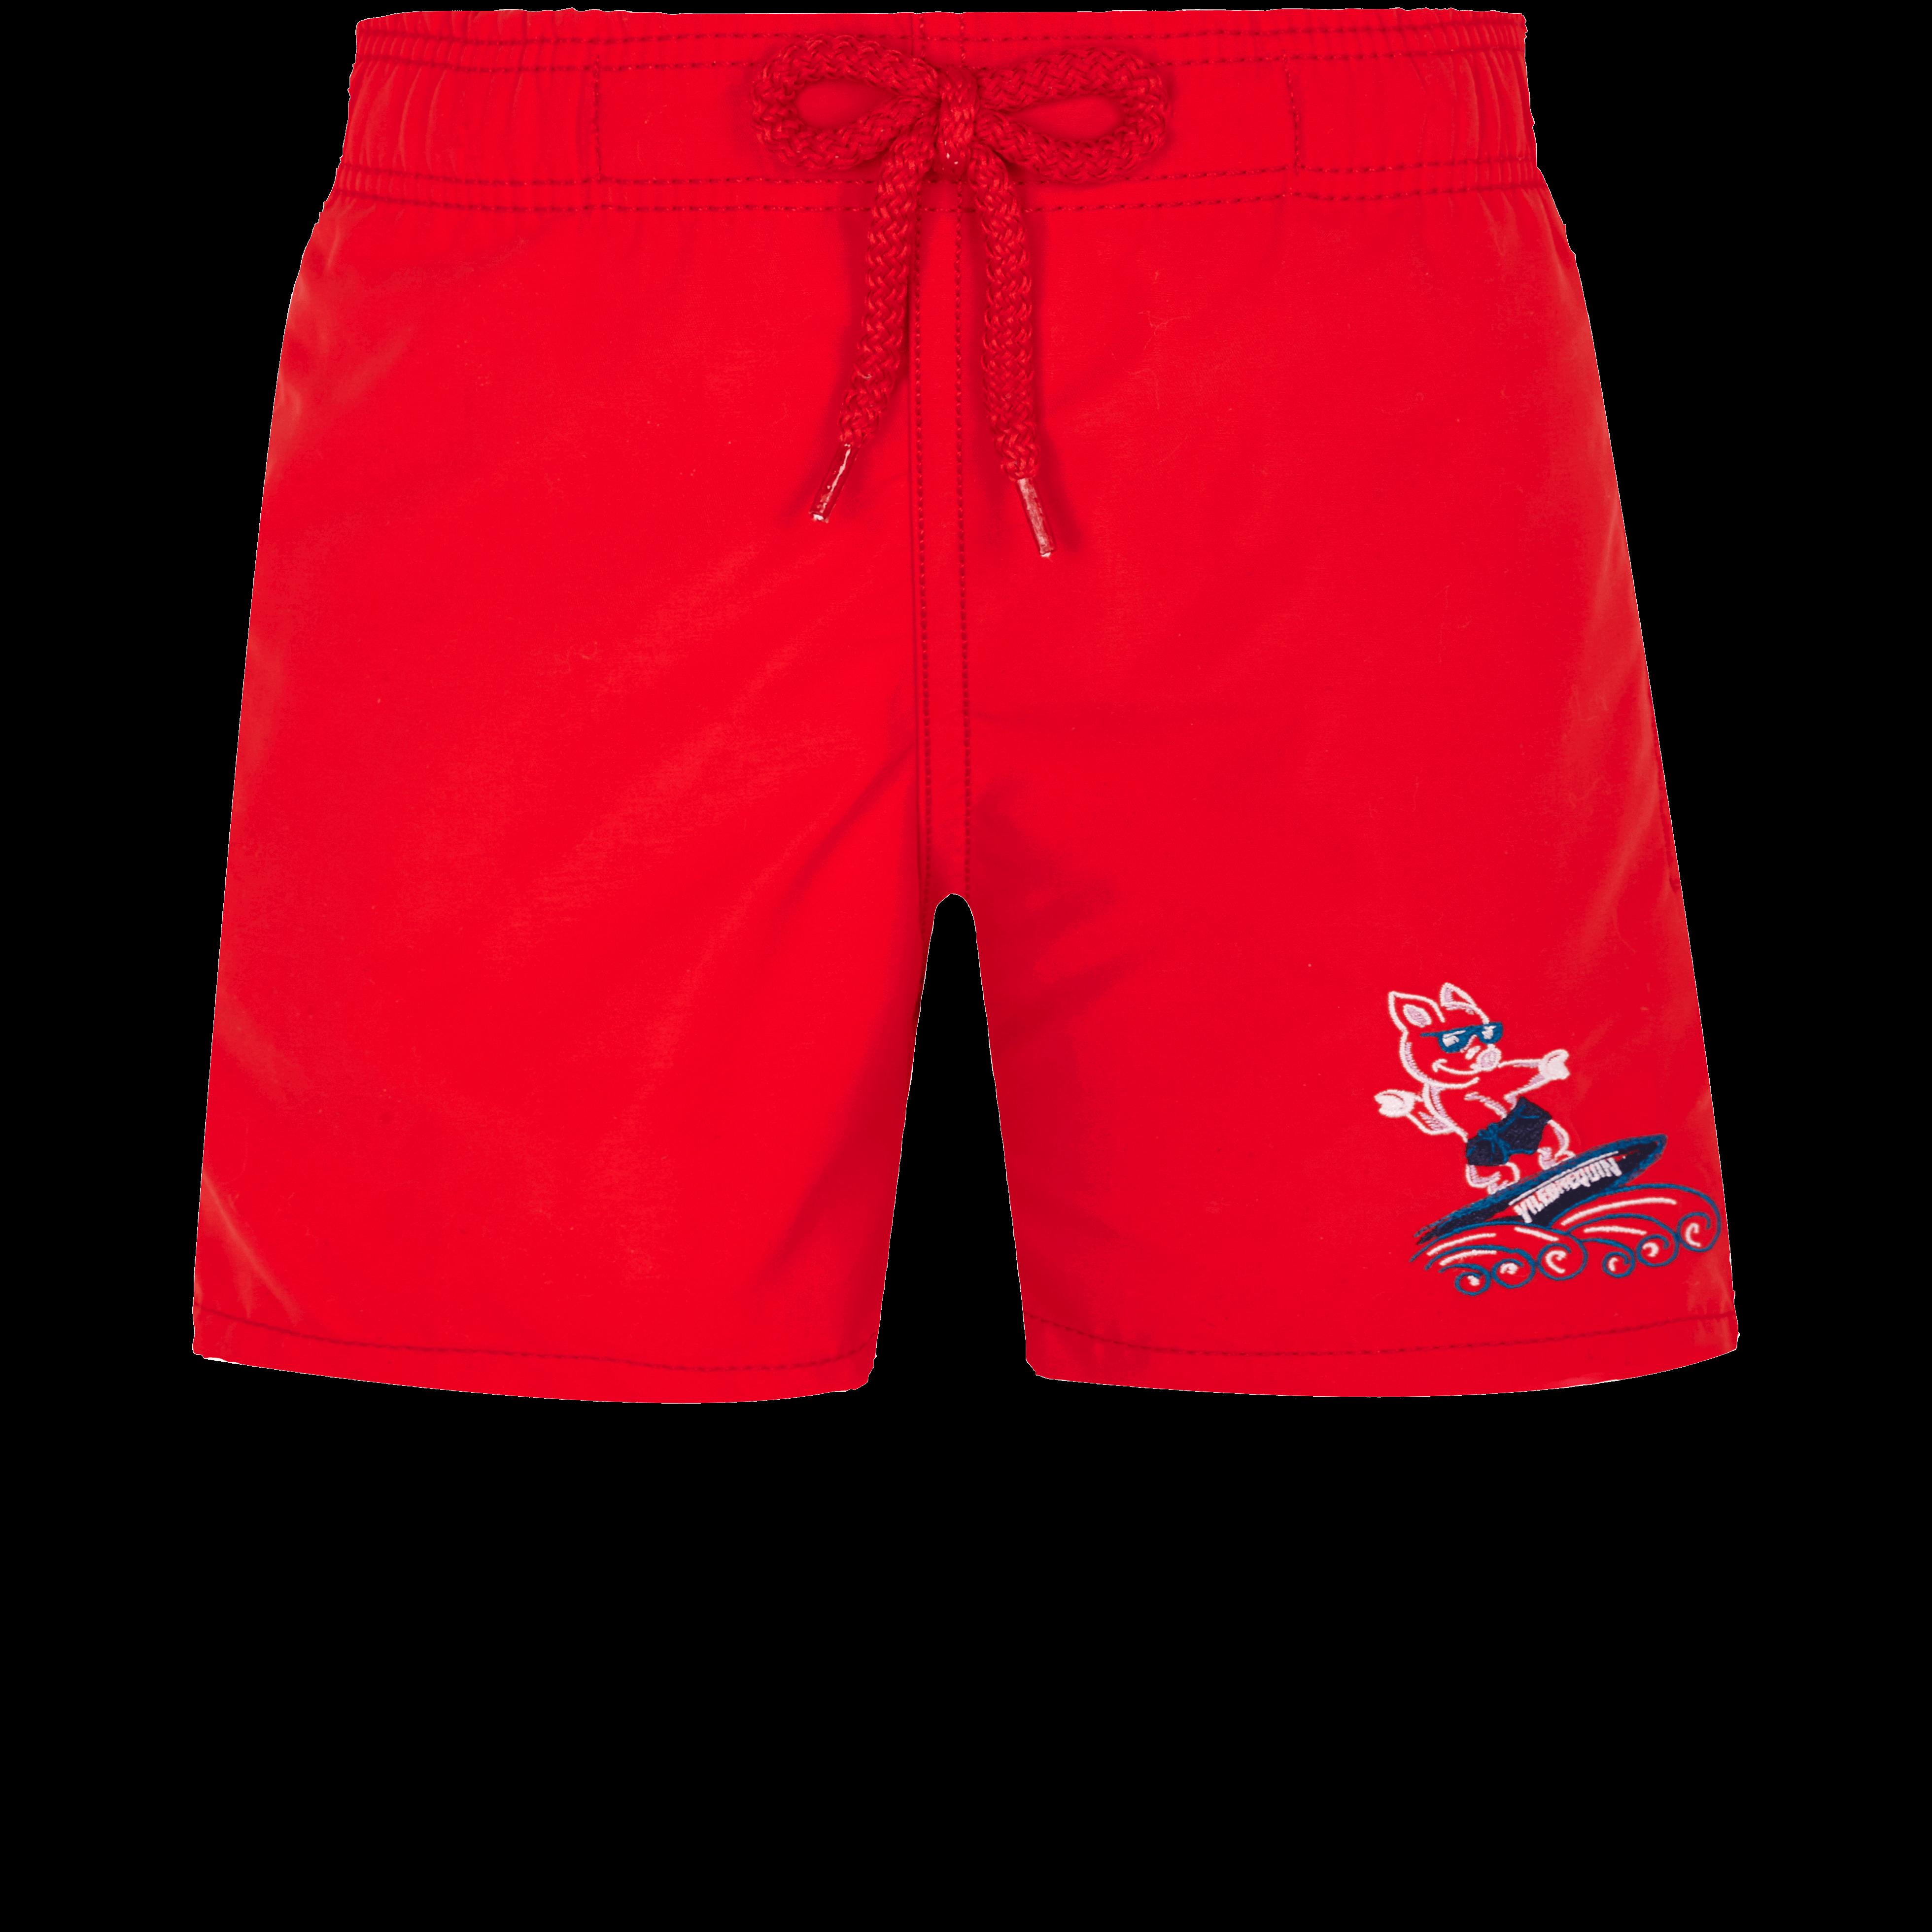 VILEBREQUIN | Boys Swimwear - Boys Swimwear The Year Of The Pig - SWIMMING TRUNK - JIM - Red - 12 - Vilebrequin | Goxip